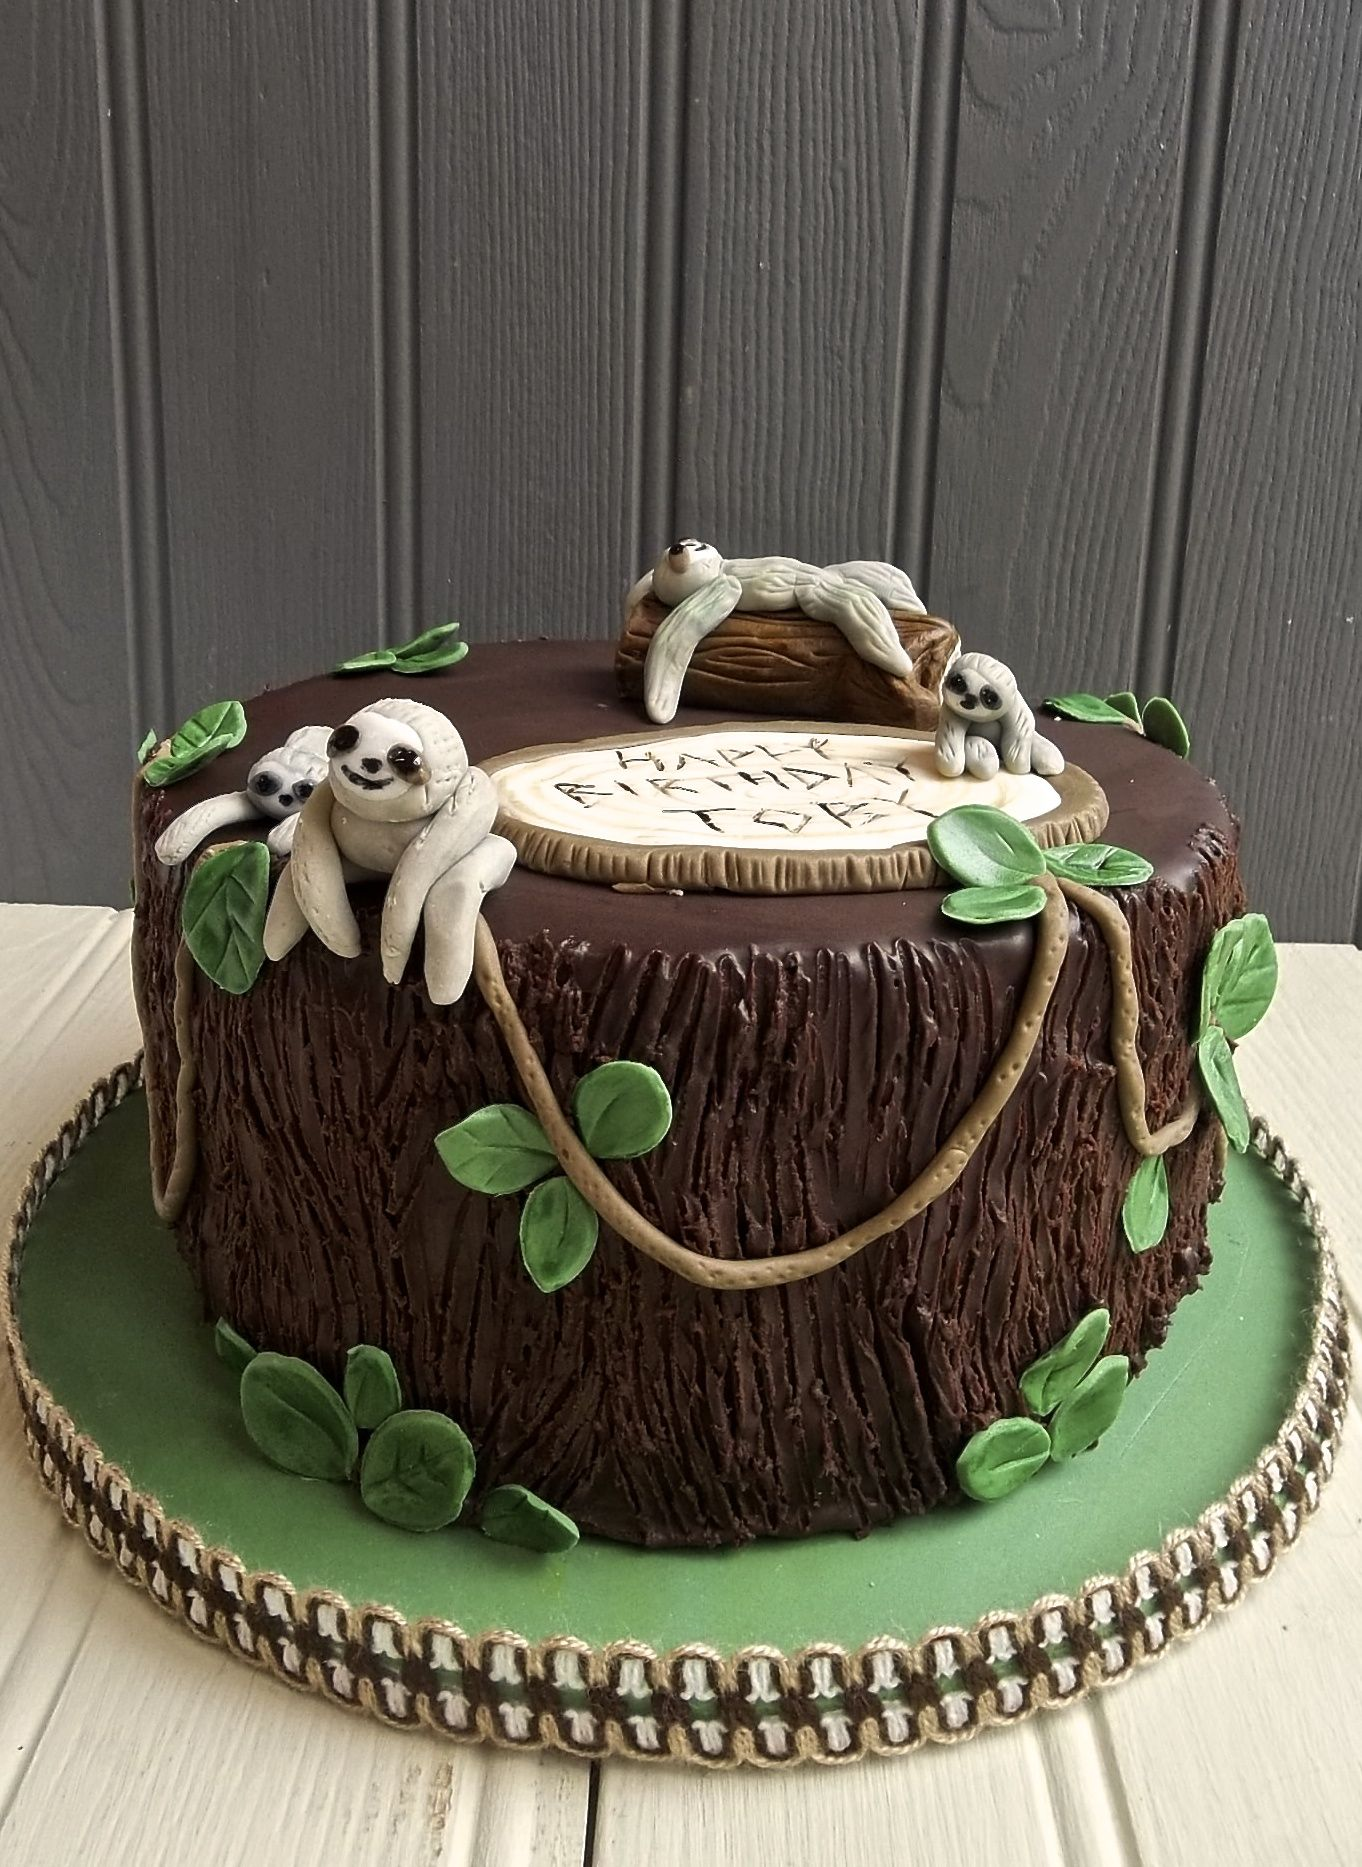 Sloth Cake Eat My Cake London